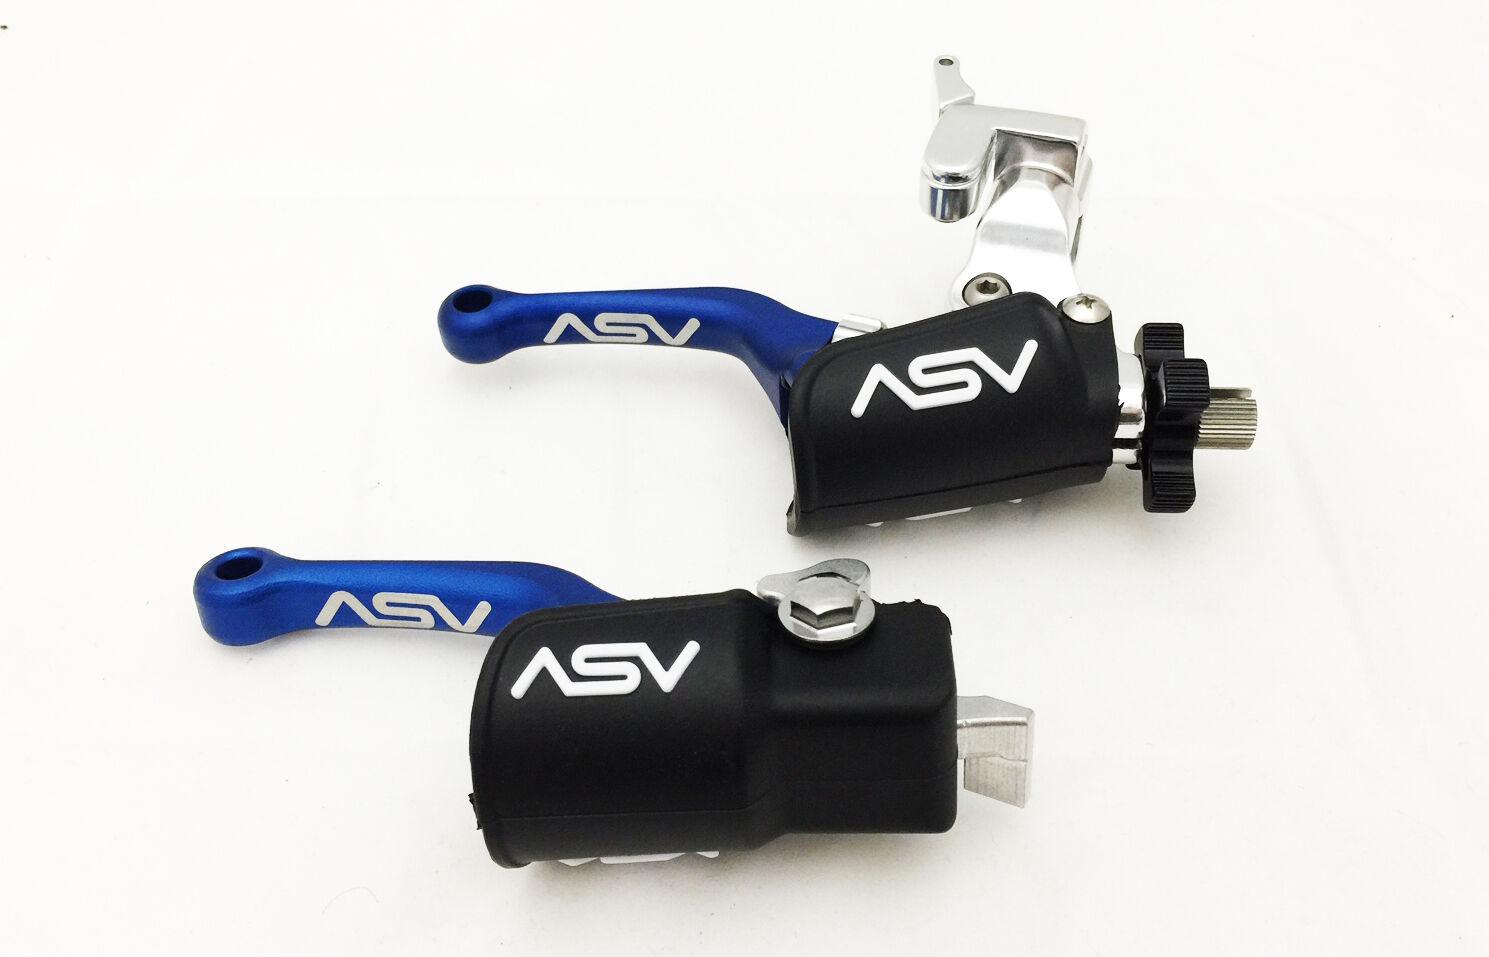 Asv C6 Shorty Shorty Shorty Paar Pack Brems Kupplungshebel Hot Start Blau TRX 450r 2004 - 2005 8795a6